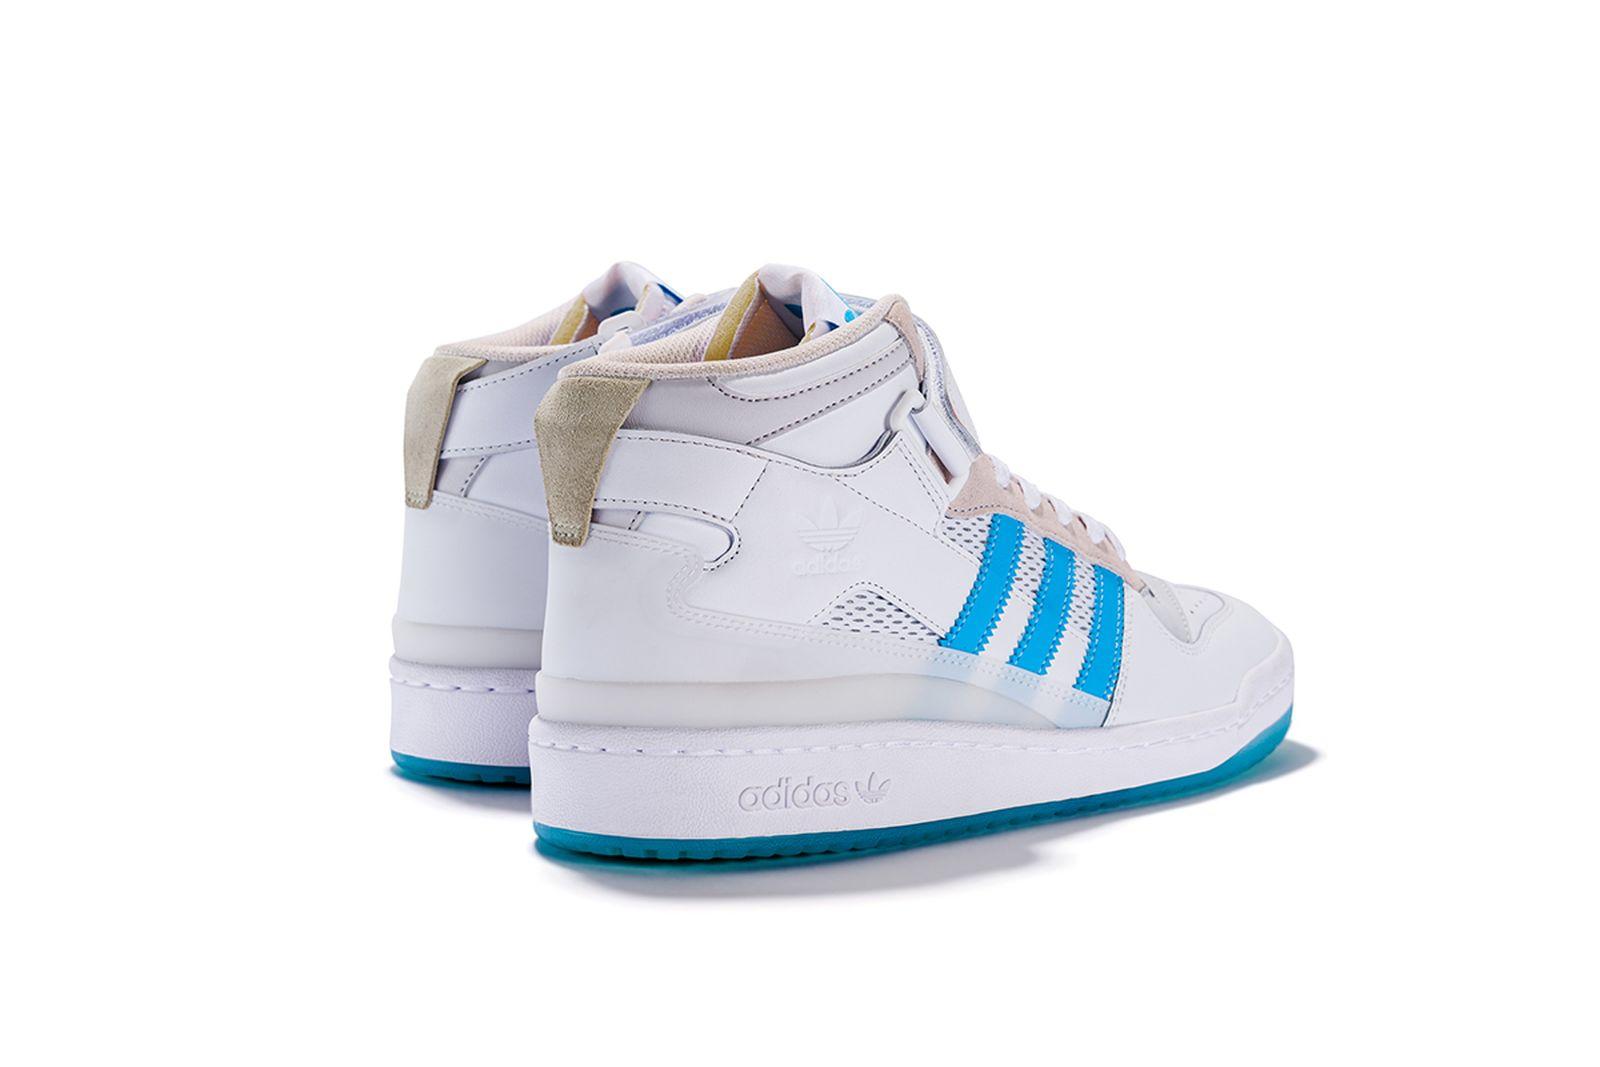 adidas-skateboarding-forum-84-adv-diego-najera-release-date-price-1-07